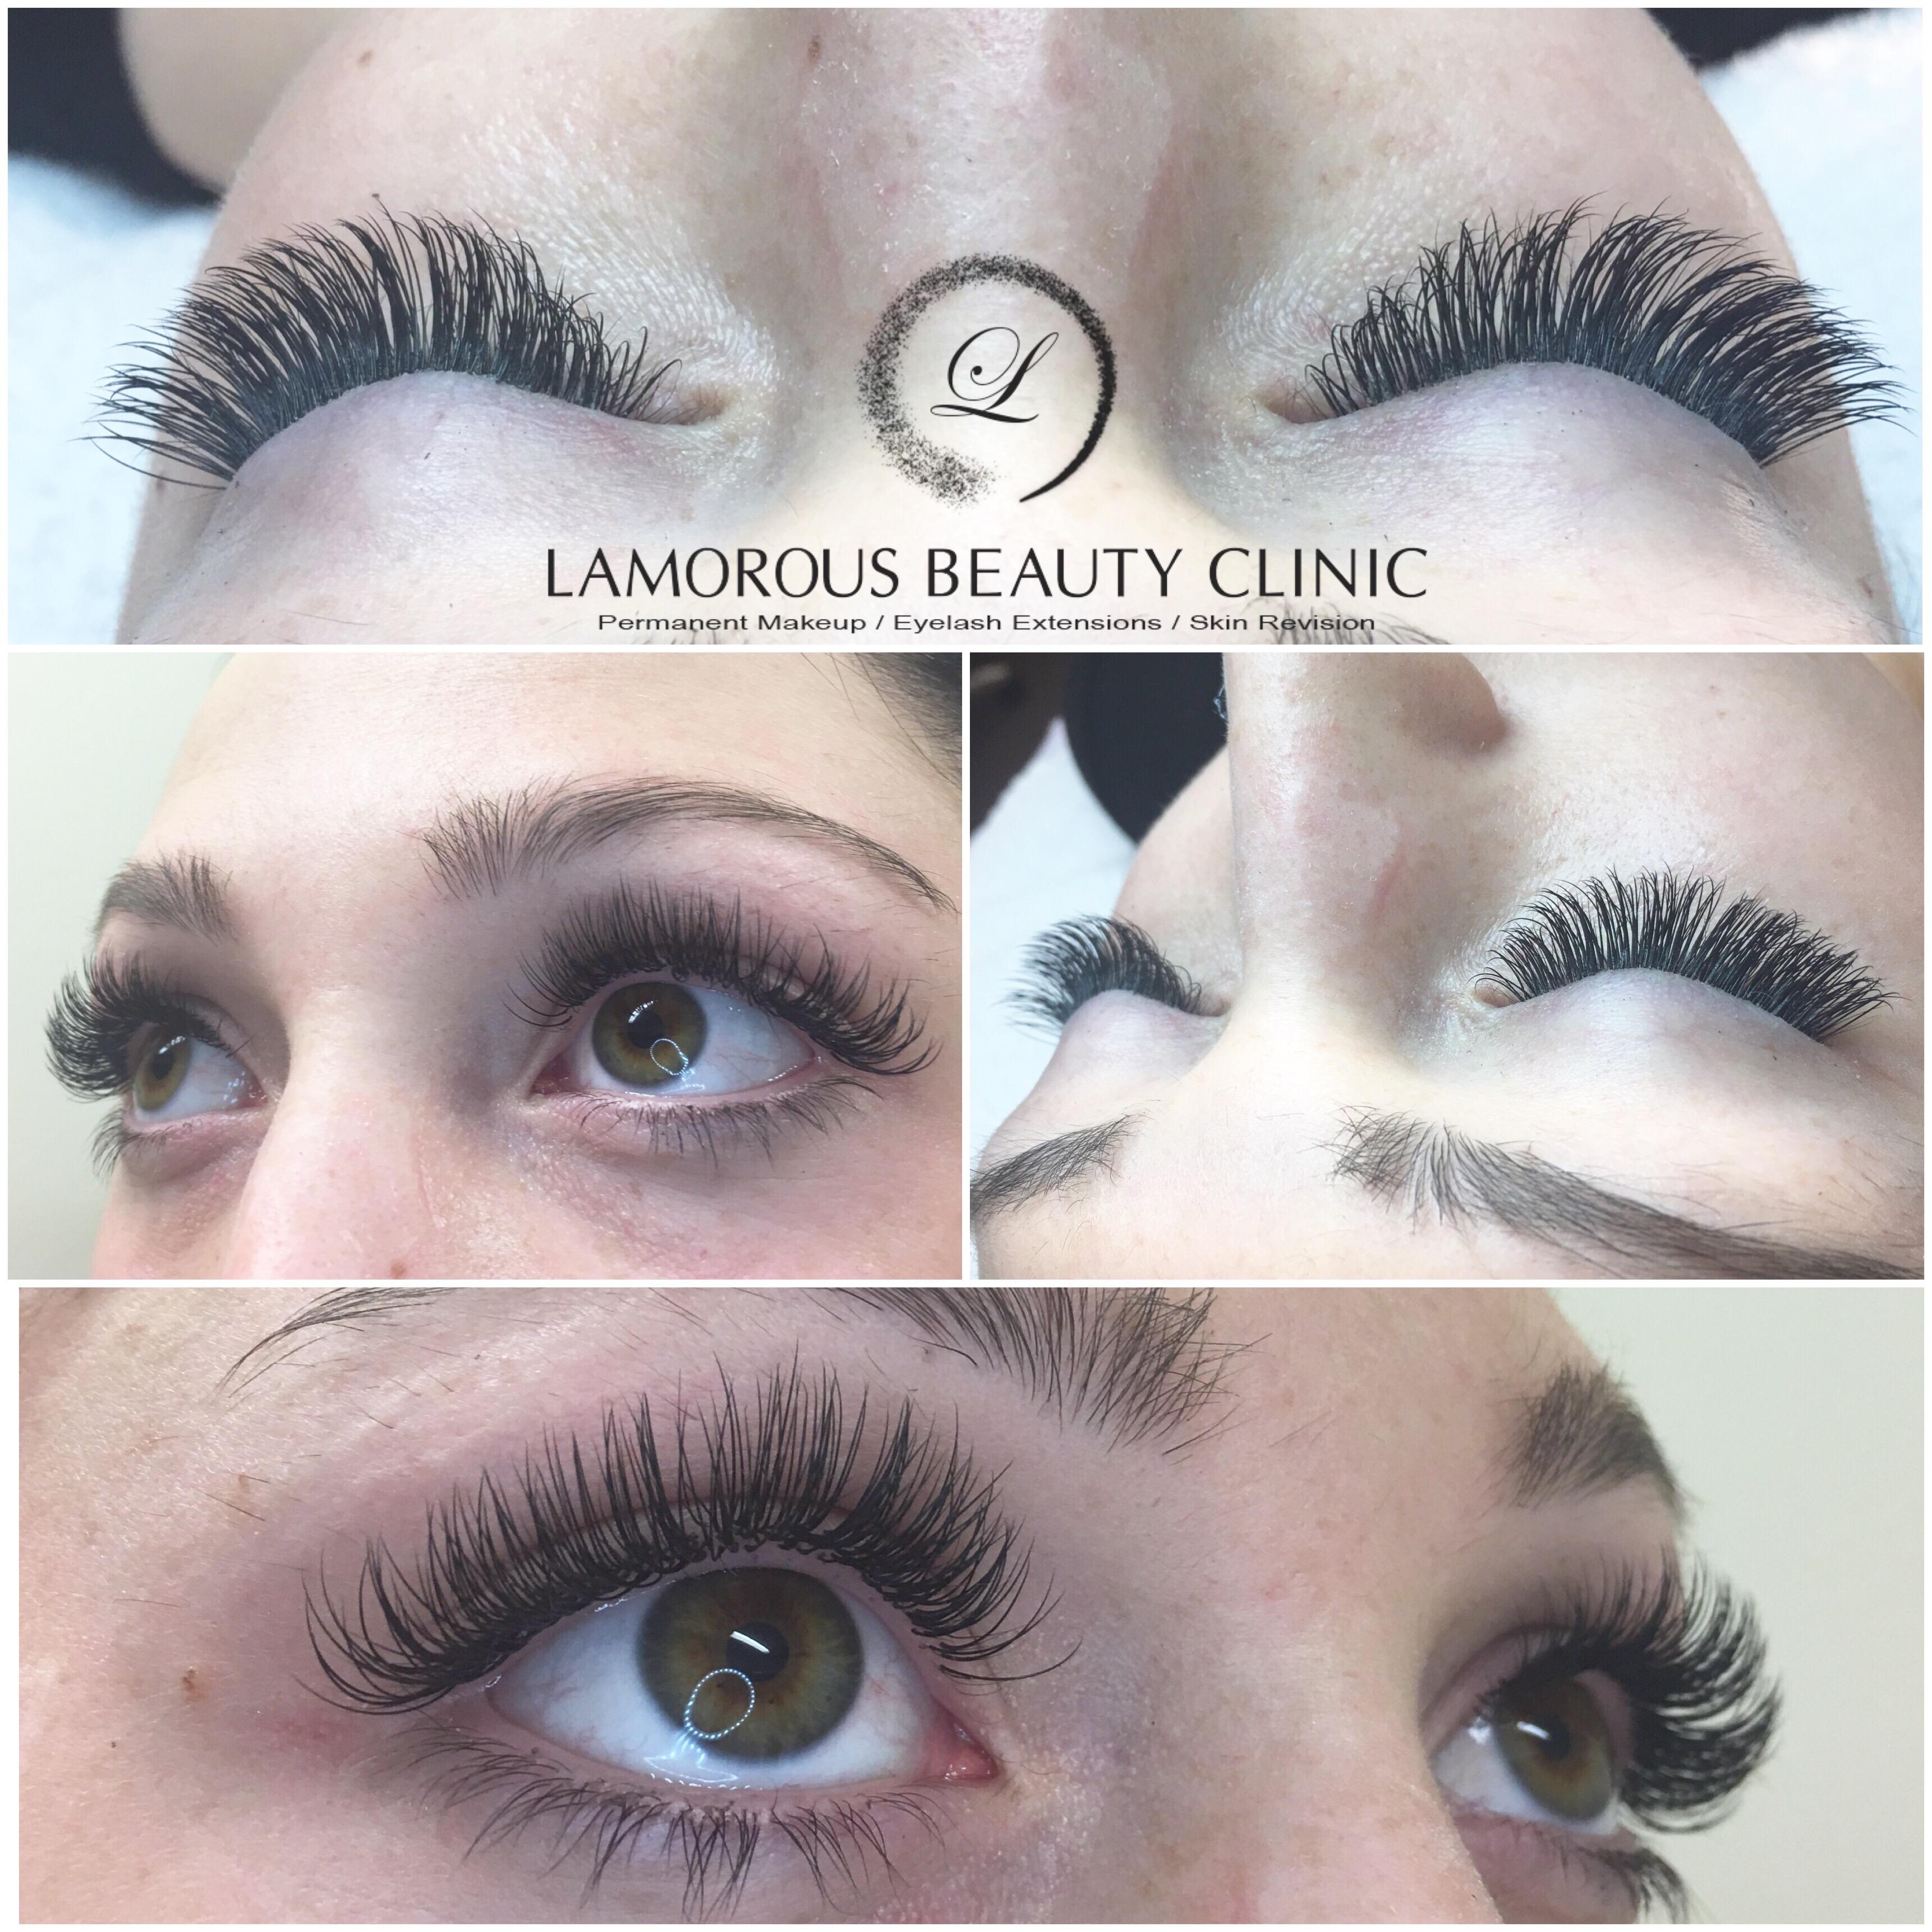 Lamorous Beauty Clinic Eyelash Extensions 22017 Saskatoon